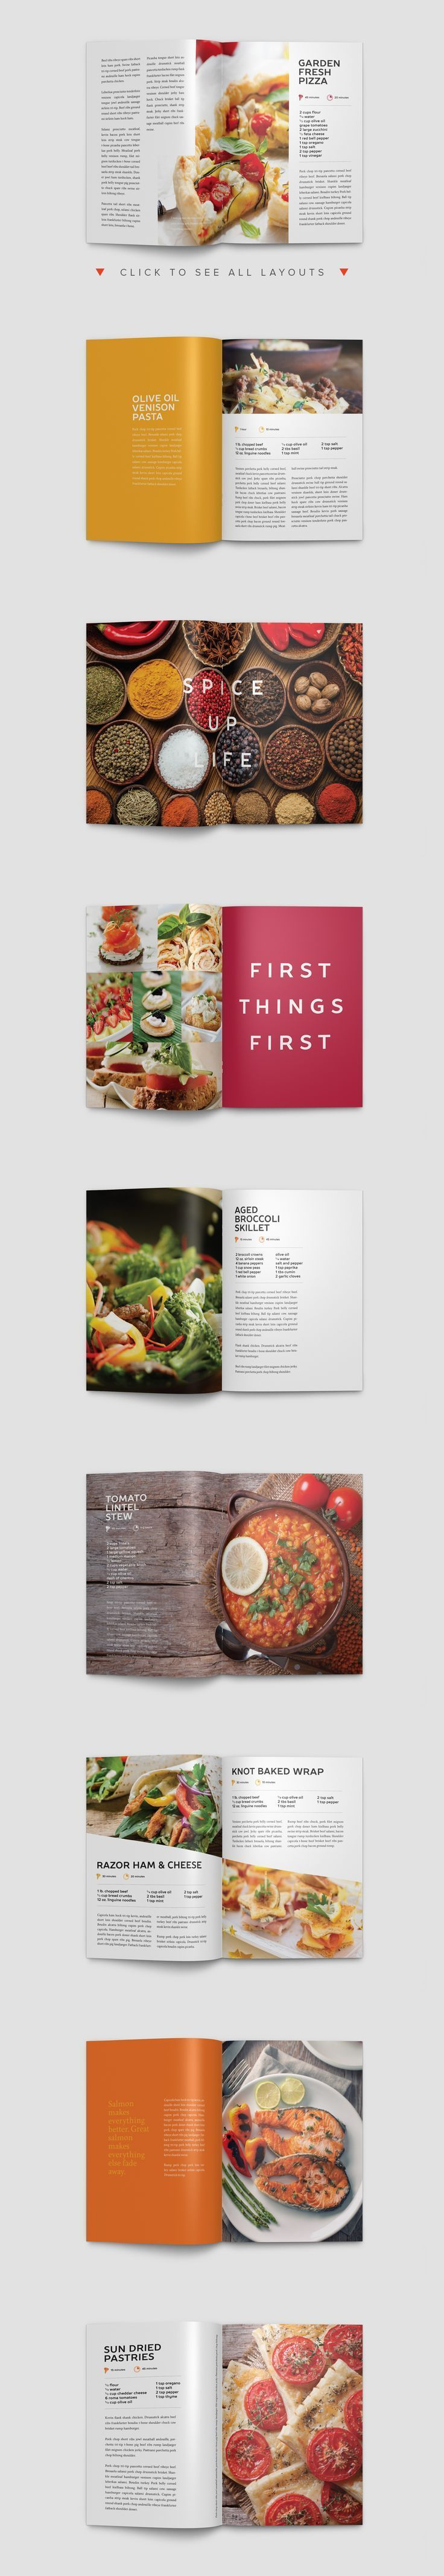 Modern Cookbook InDesign Template Modern Cookbooks Indesign - Indesign recipe book template